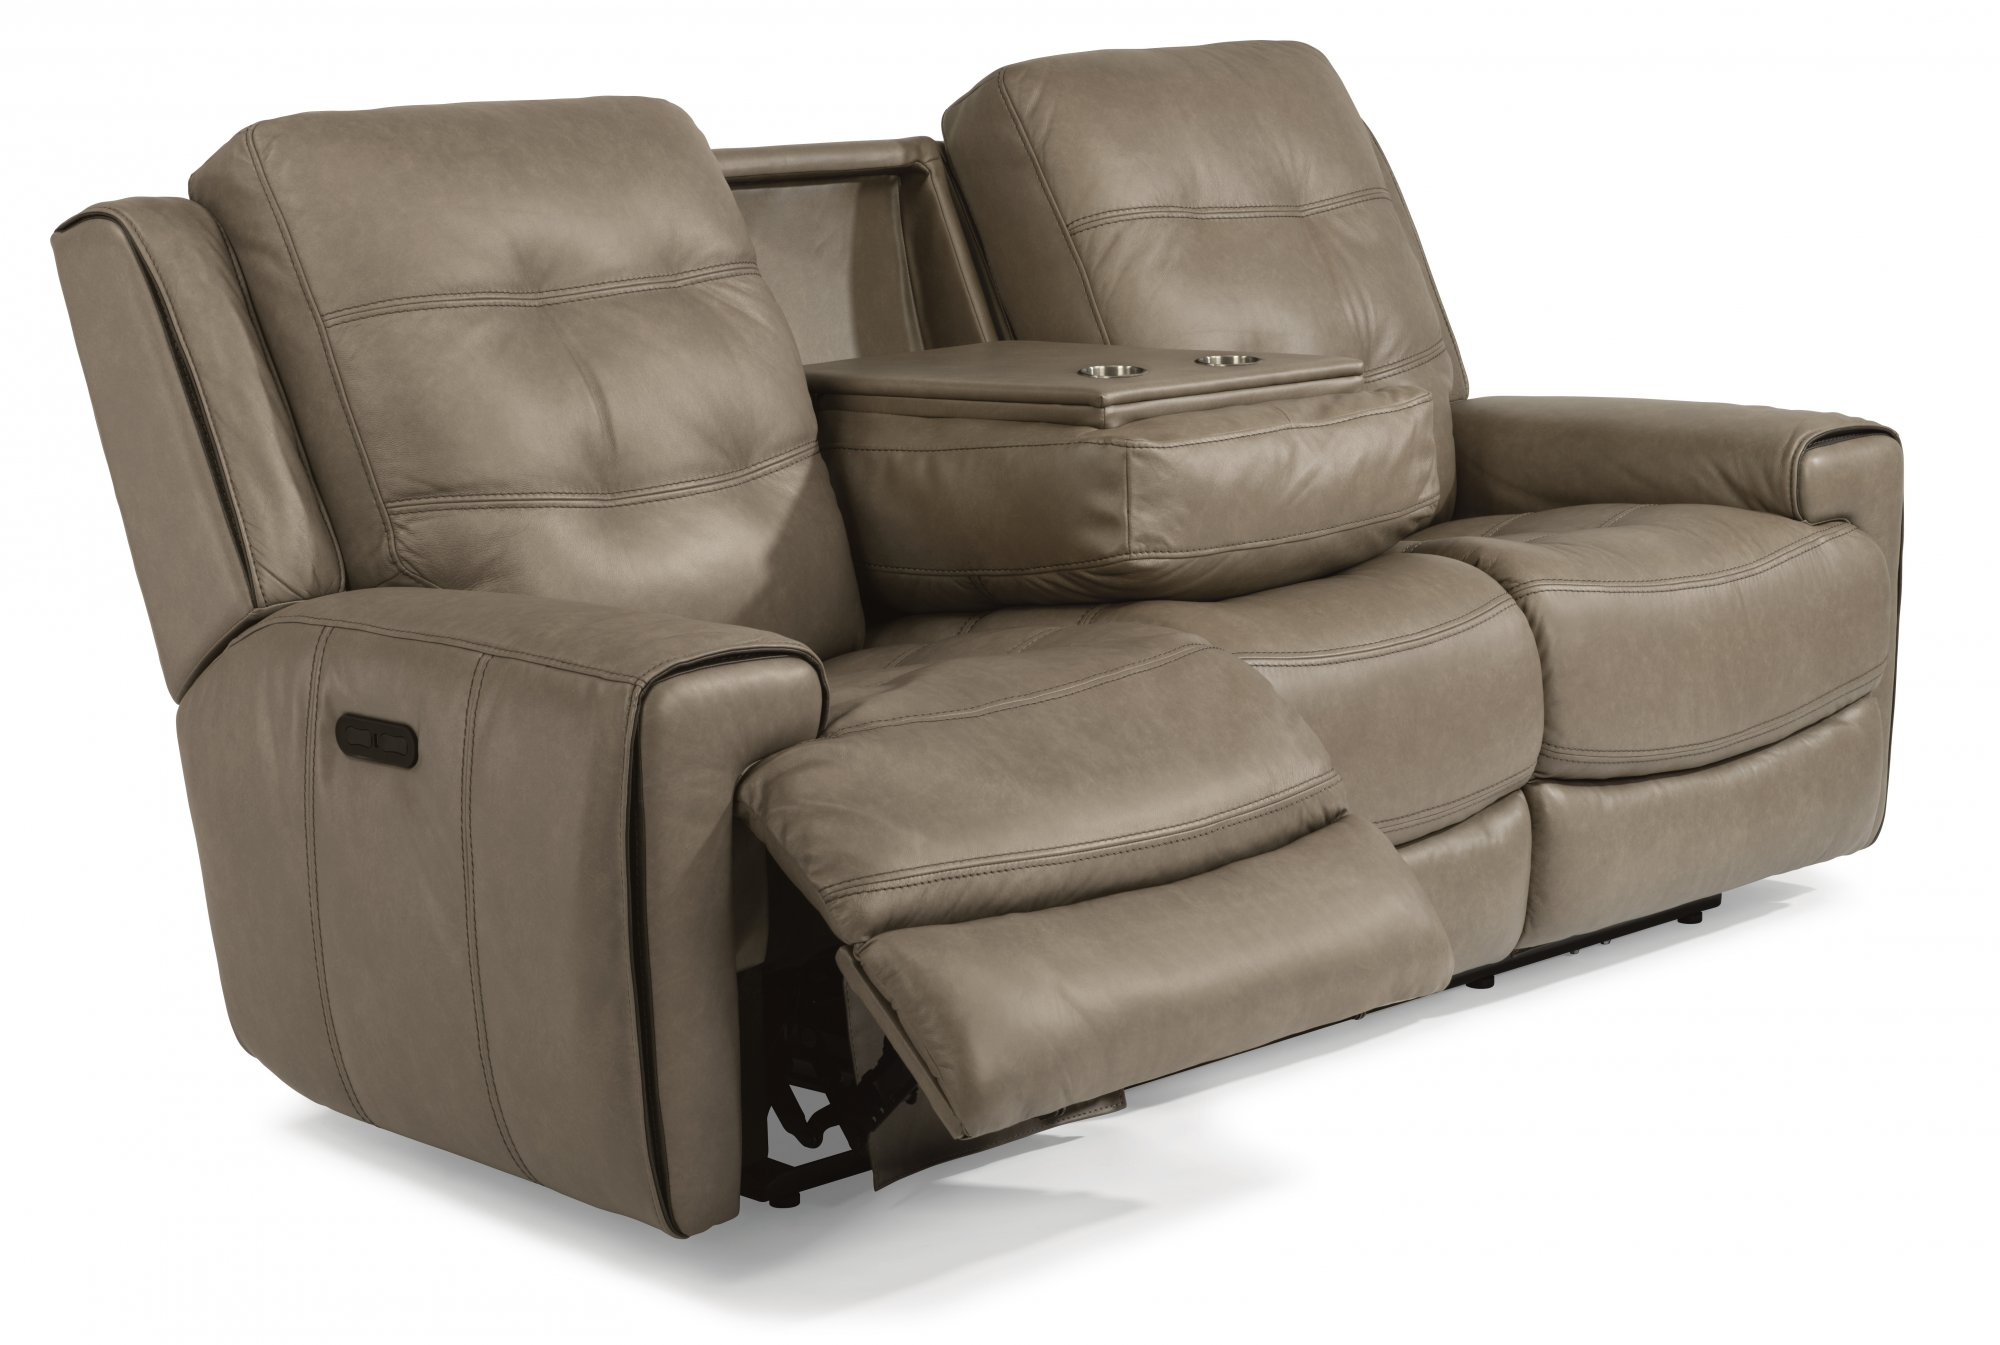 Leather Power Reclining Sofa Set